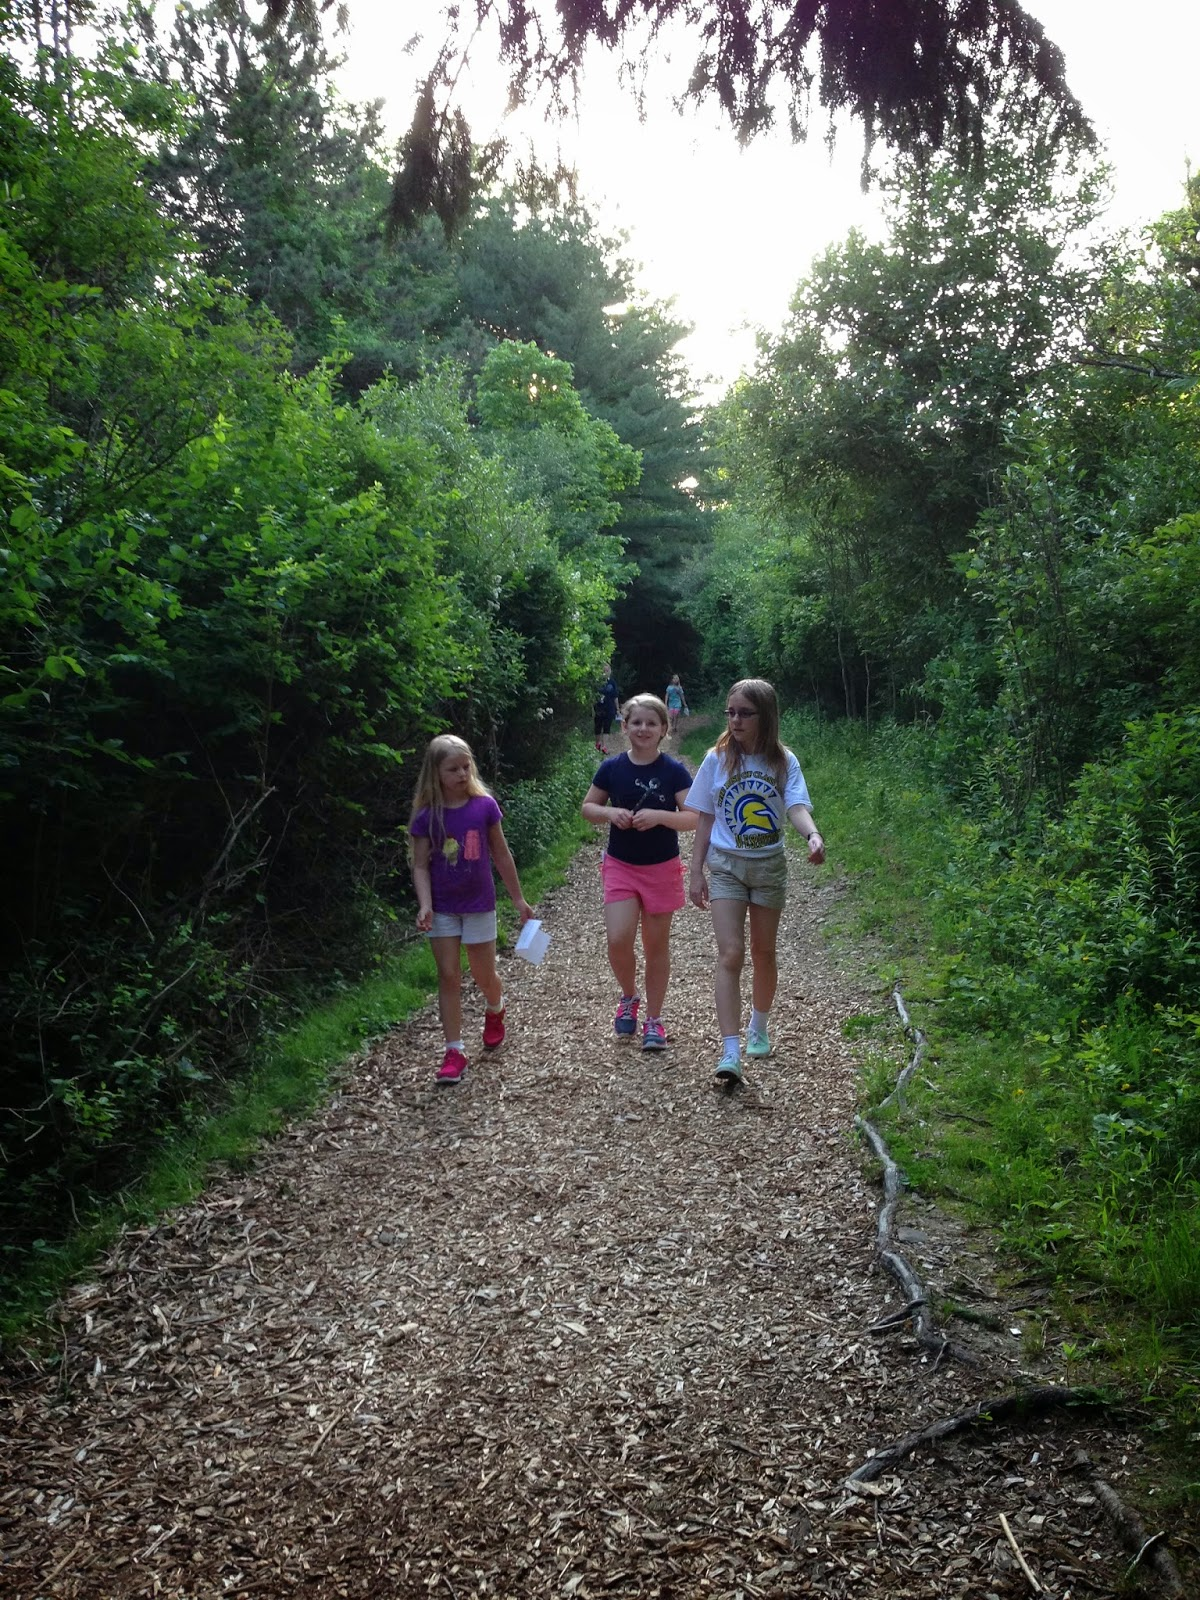 Nature Trail Scavenger Hunt - Free Printable. From Hi! It's Jilly #kids #nature #scavengerhunt